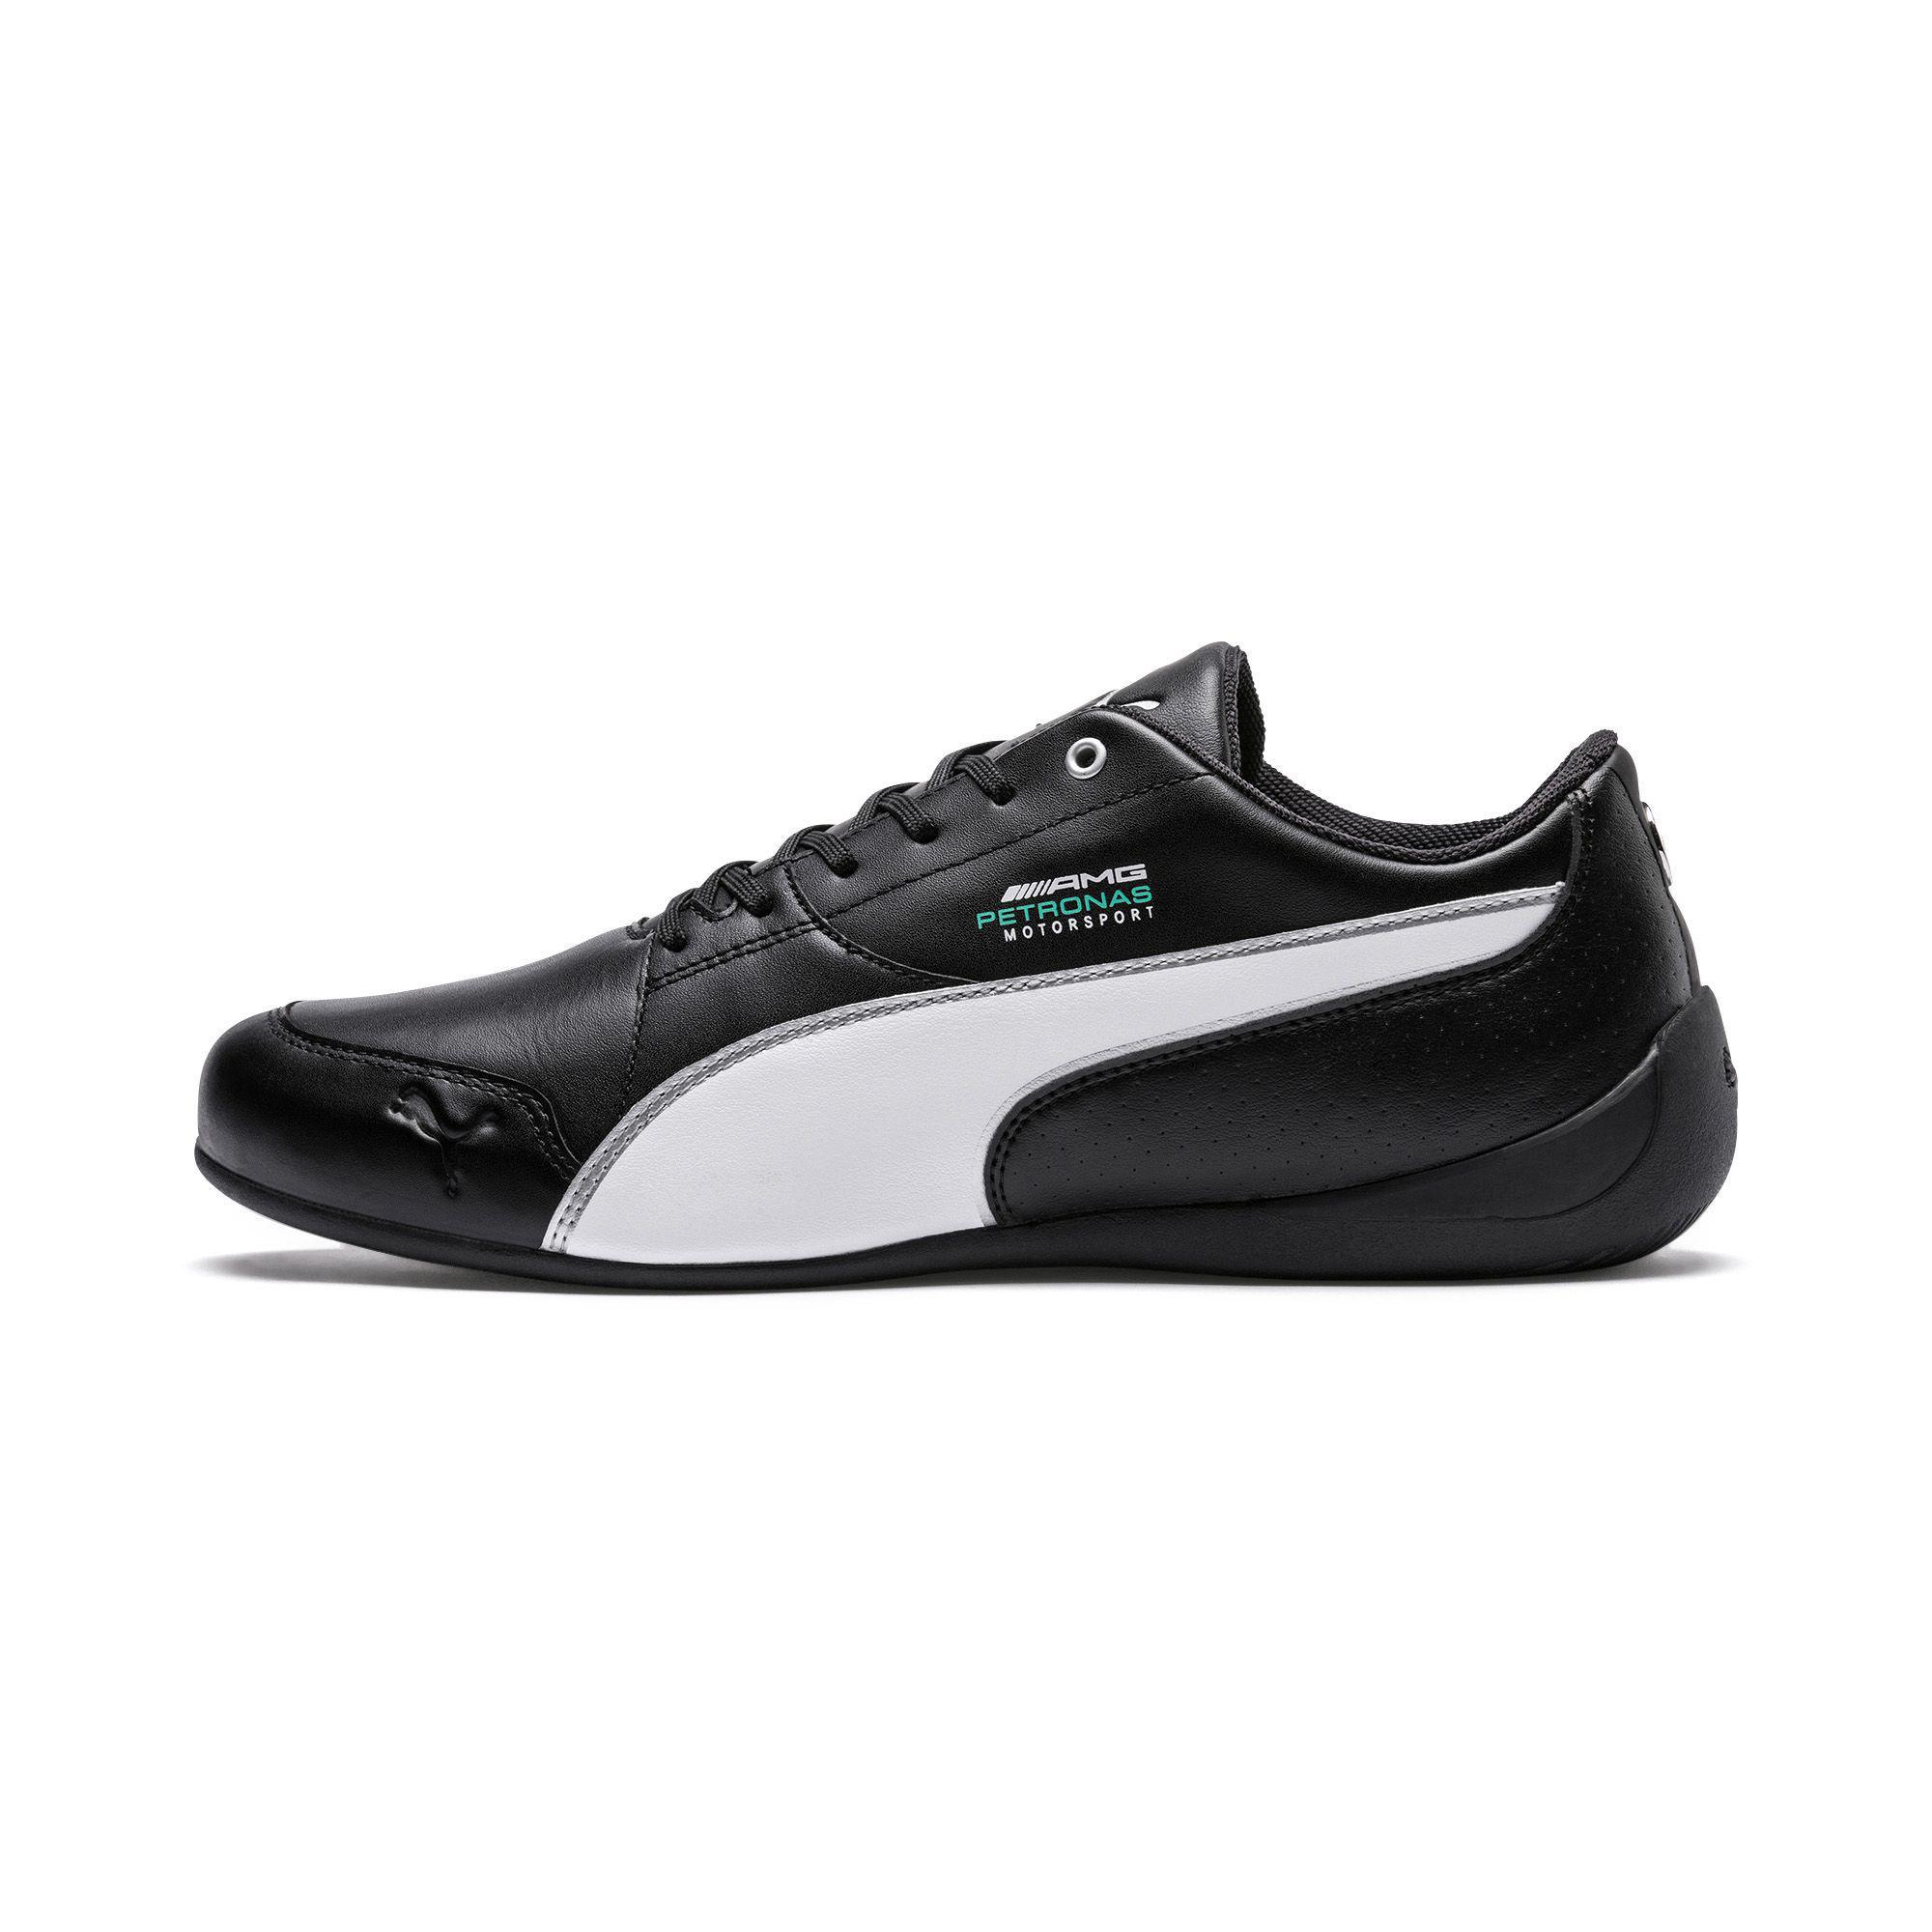 2c2338333e2e73 Lyst - PUMA Mercedes Amg Petronas Motorsport Drift Cat 7 Sneakers in ...